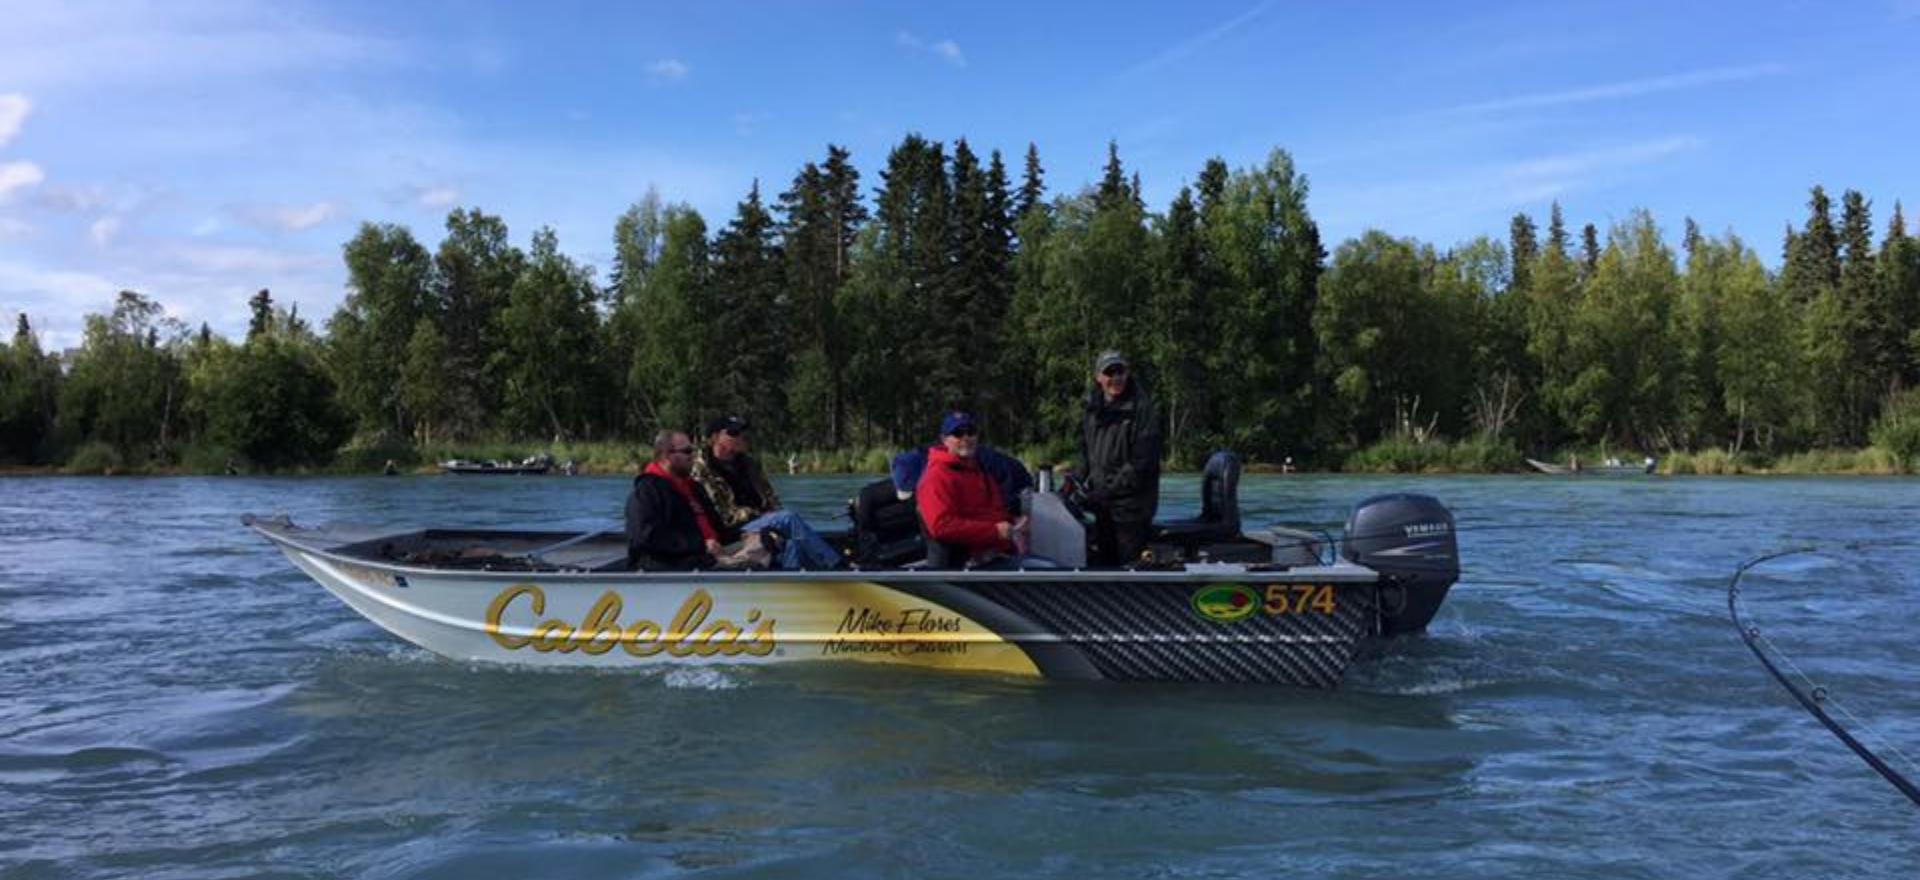 Soaring Eagle Lodge Fishing & Adventures, LLC